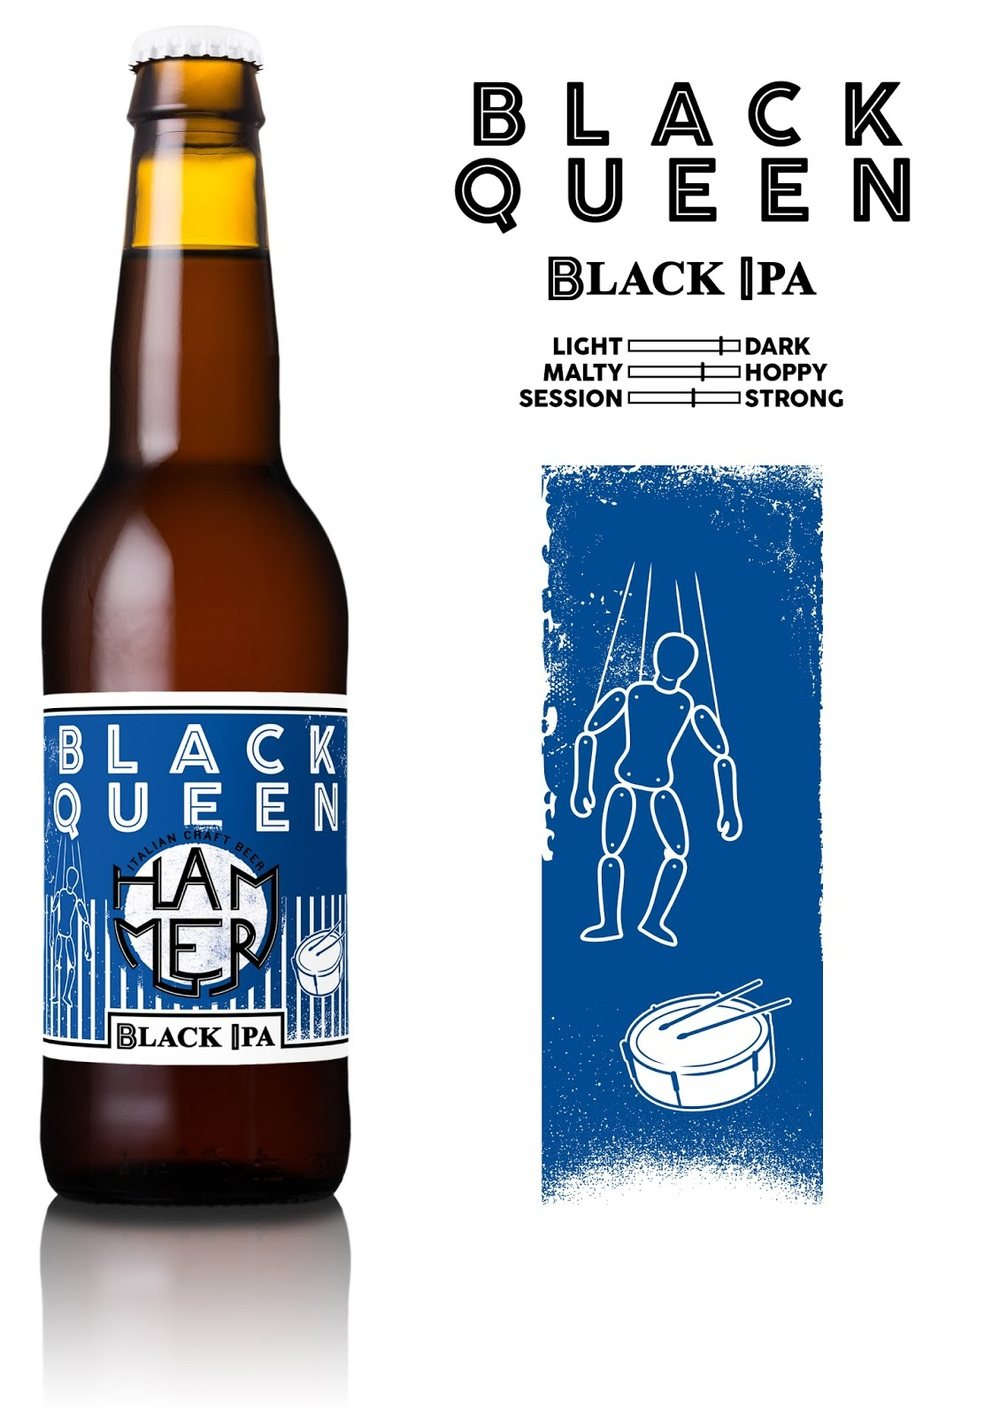 06_BLACK-QUEEN_black-ipa.jpg